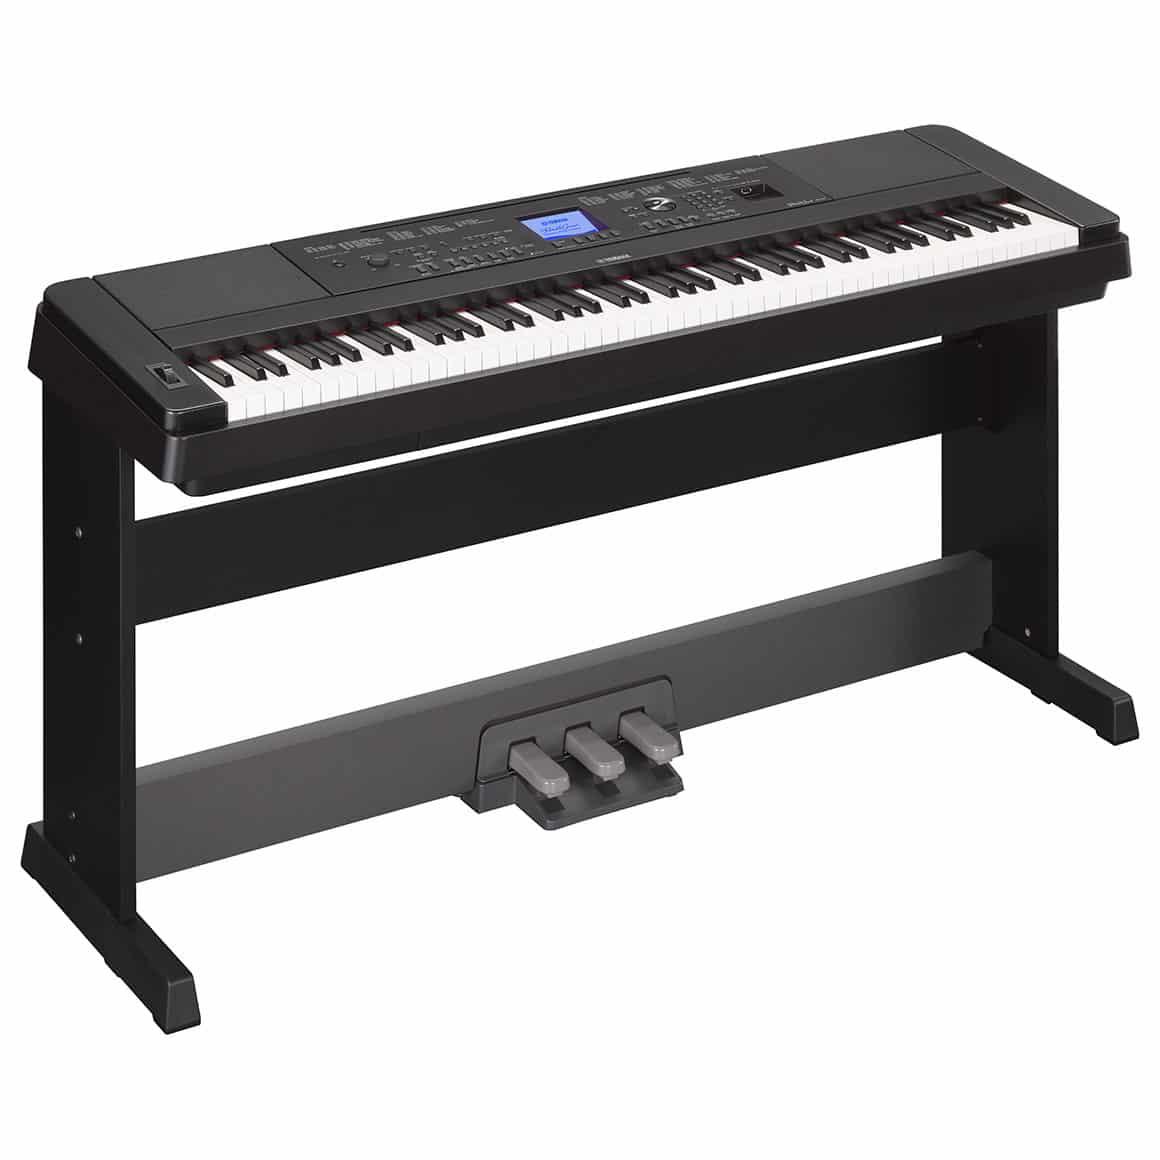 Yamaha-Digital-Piano-DGX-660-BW